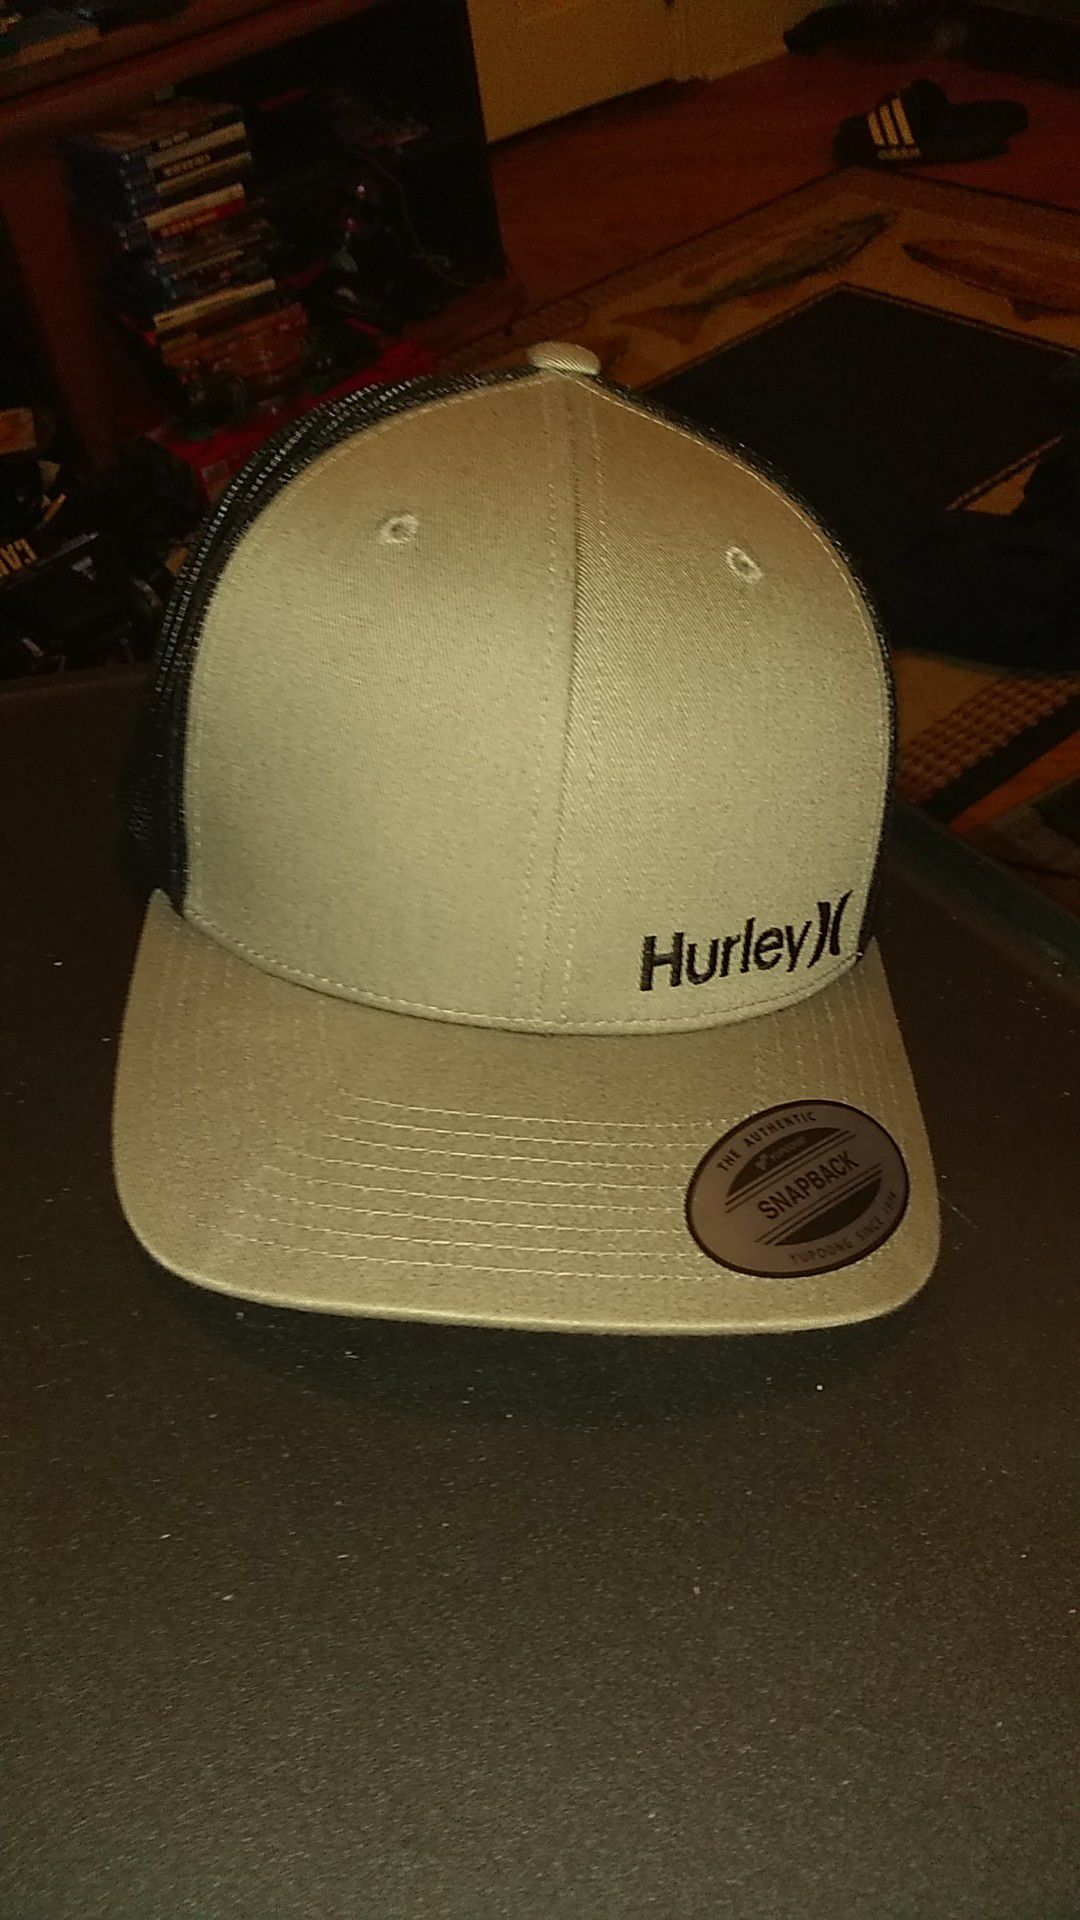 New Hurley hat